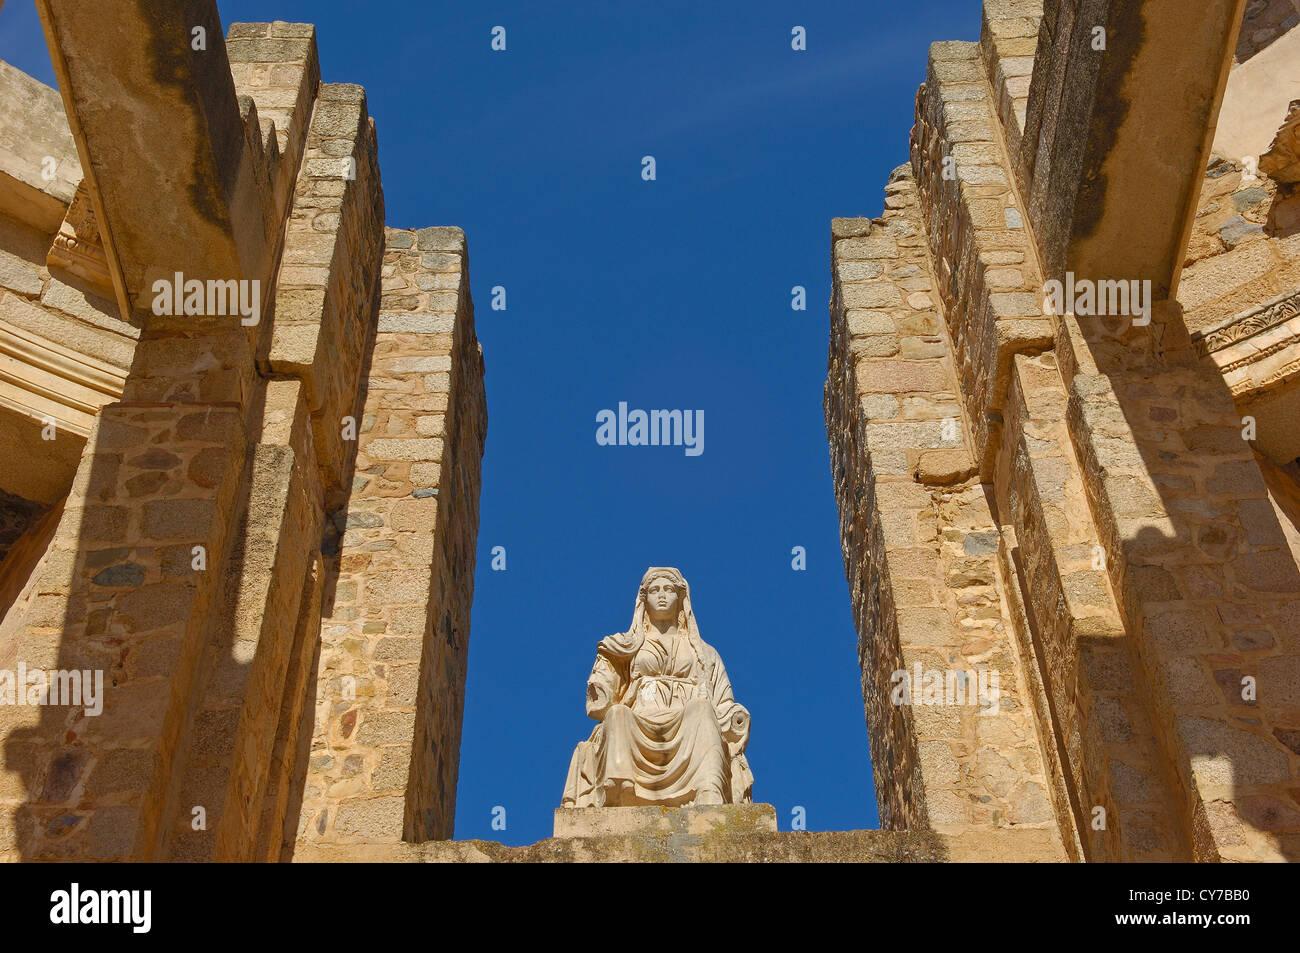 Teatro romano, Merida, provincia di Badajoz, Estremadura, Spagna Immagini Stock